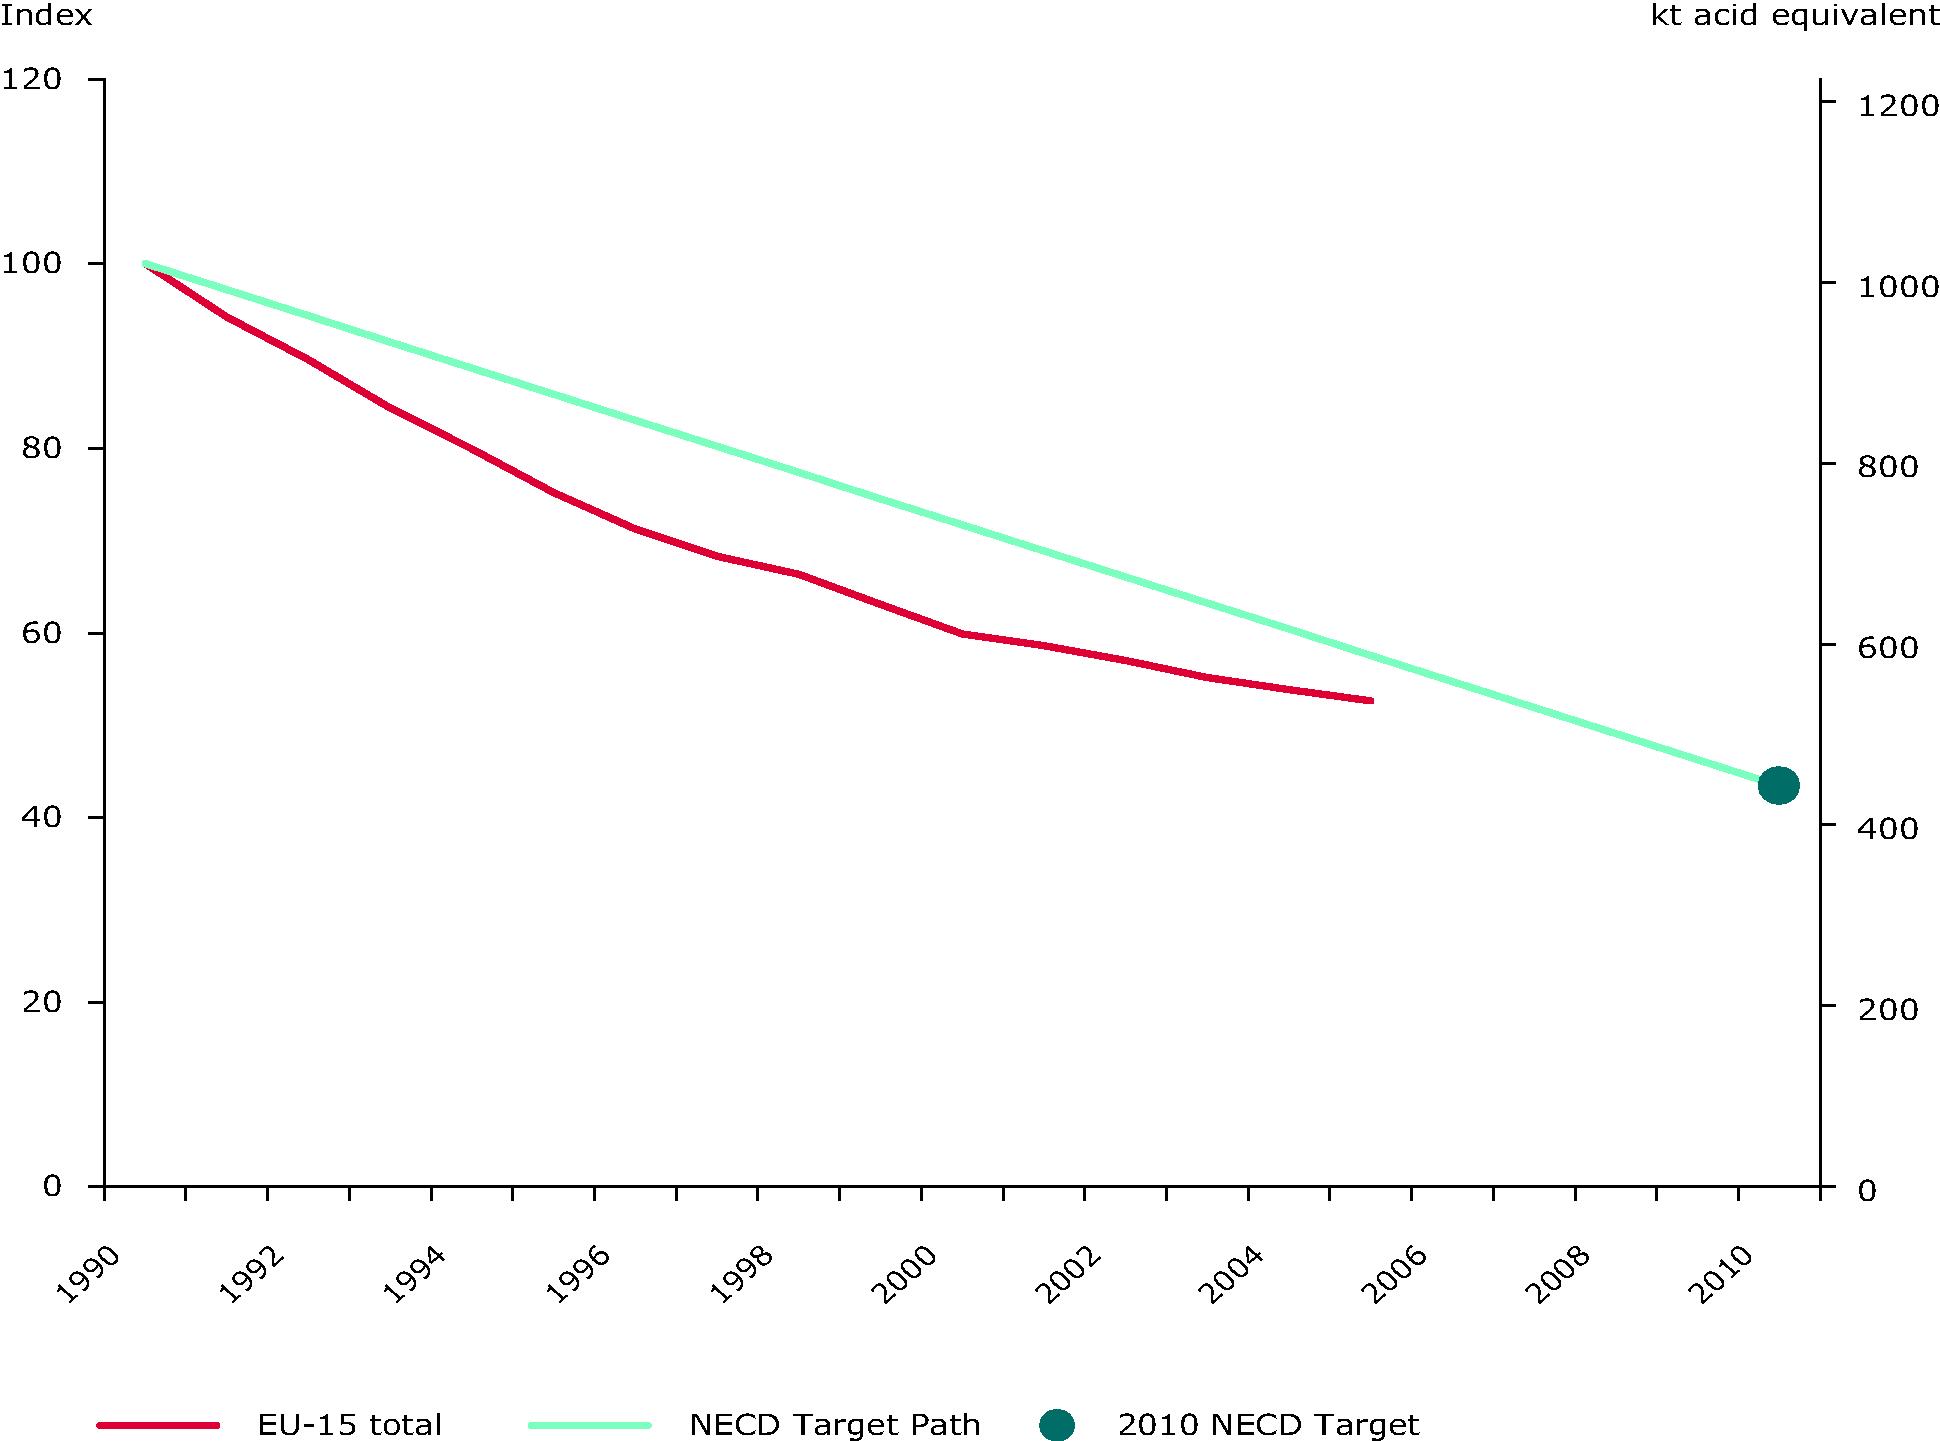 Emission trends of acidifying pollutants (ktonnes acid equivalent), (EU-15)